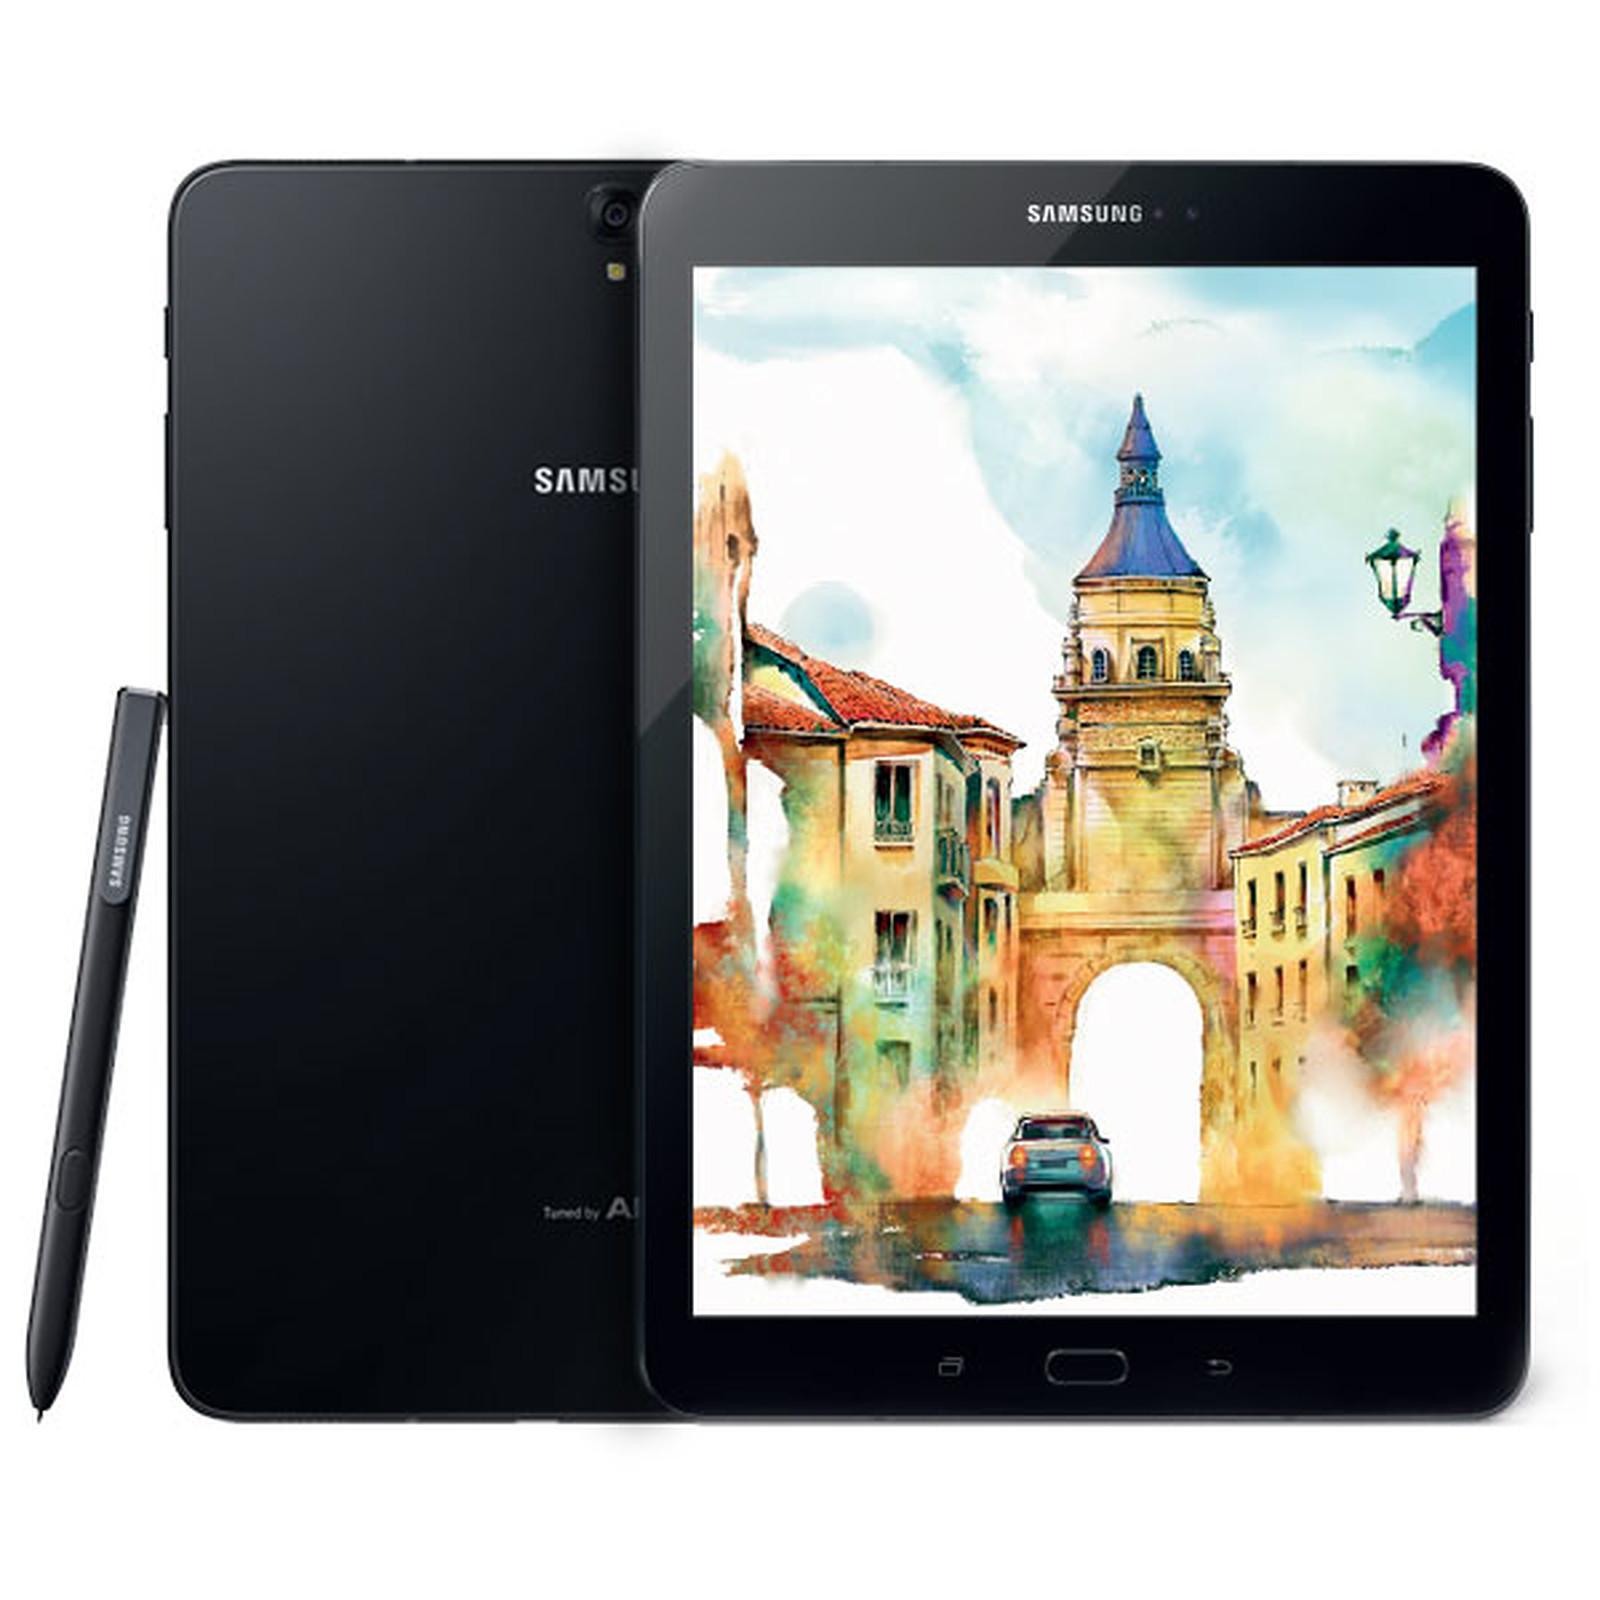 9dbcdeea8e5 Samsung Galaxy Tab S3 9.7